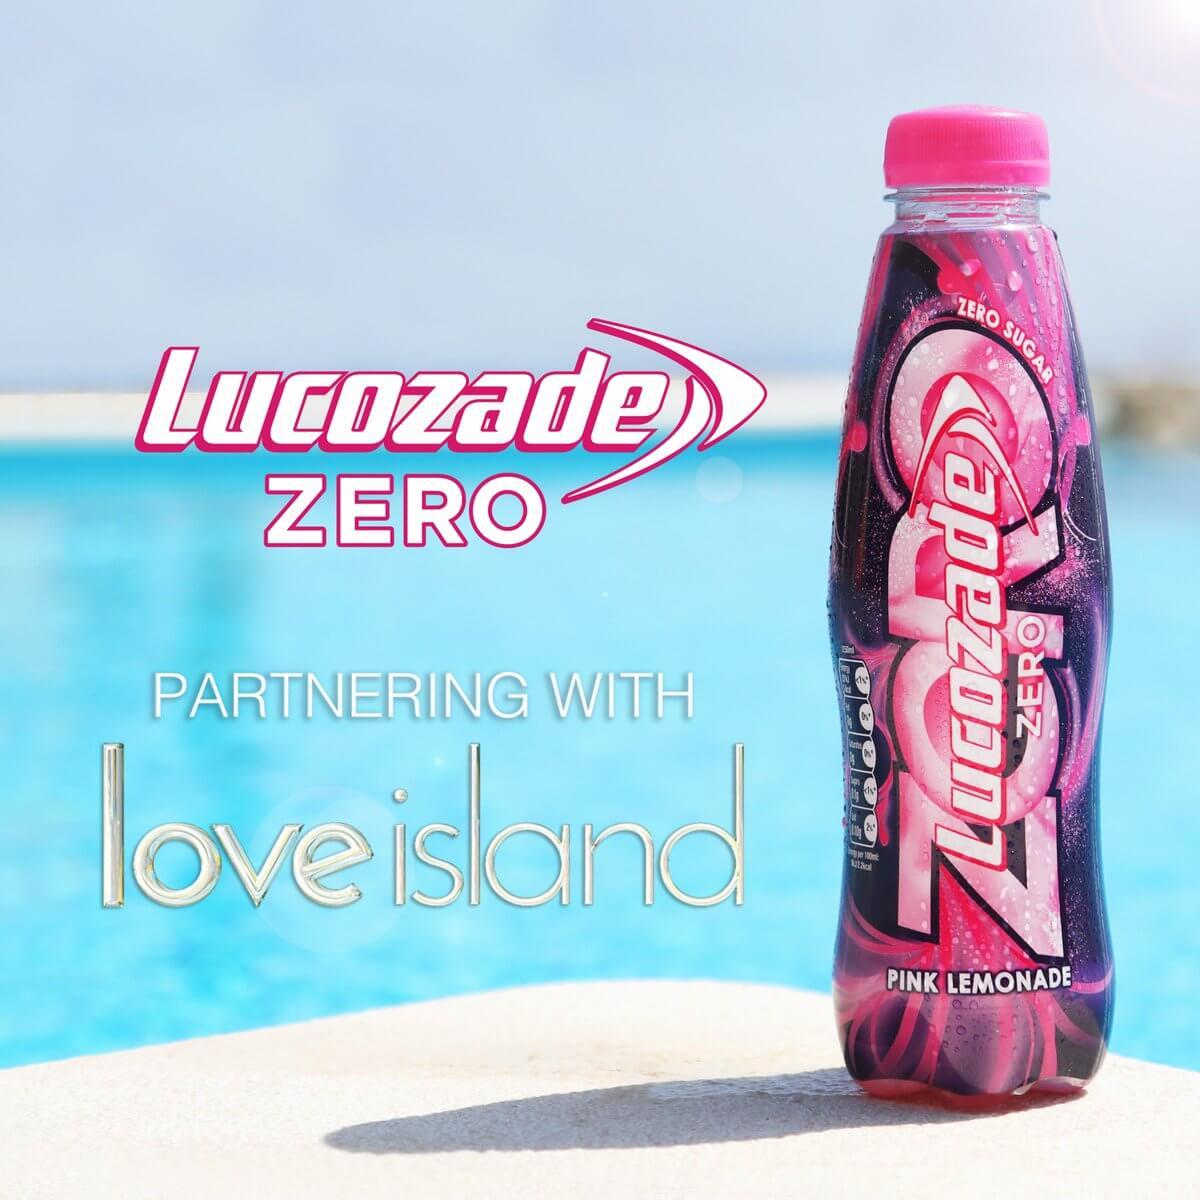 lucozade zero partnering with love island